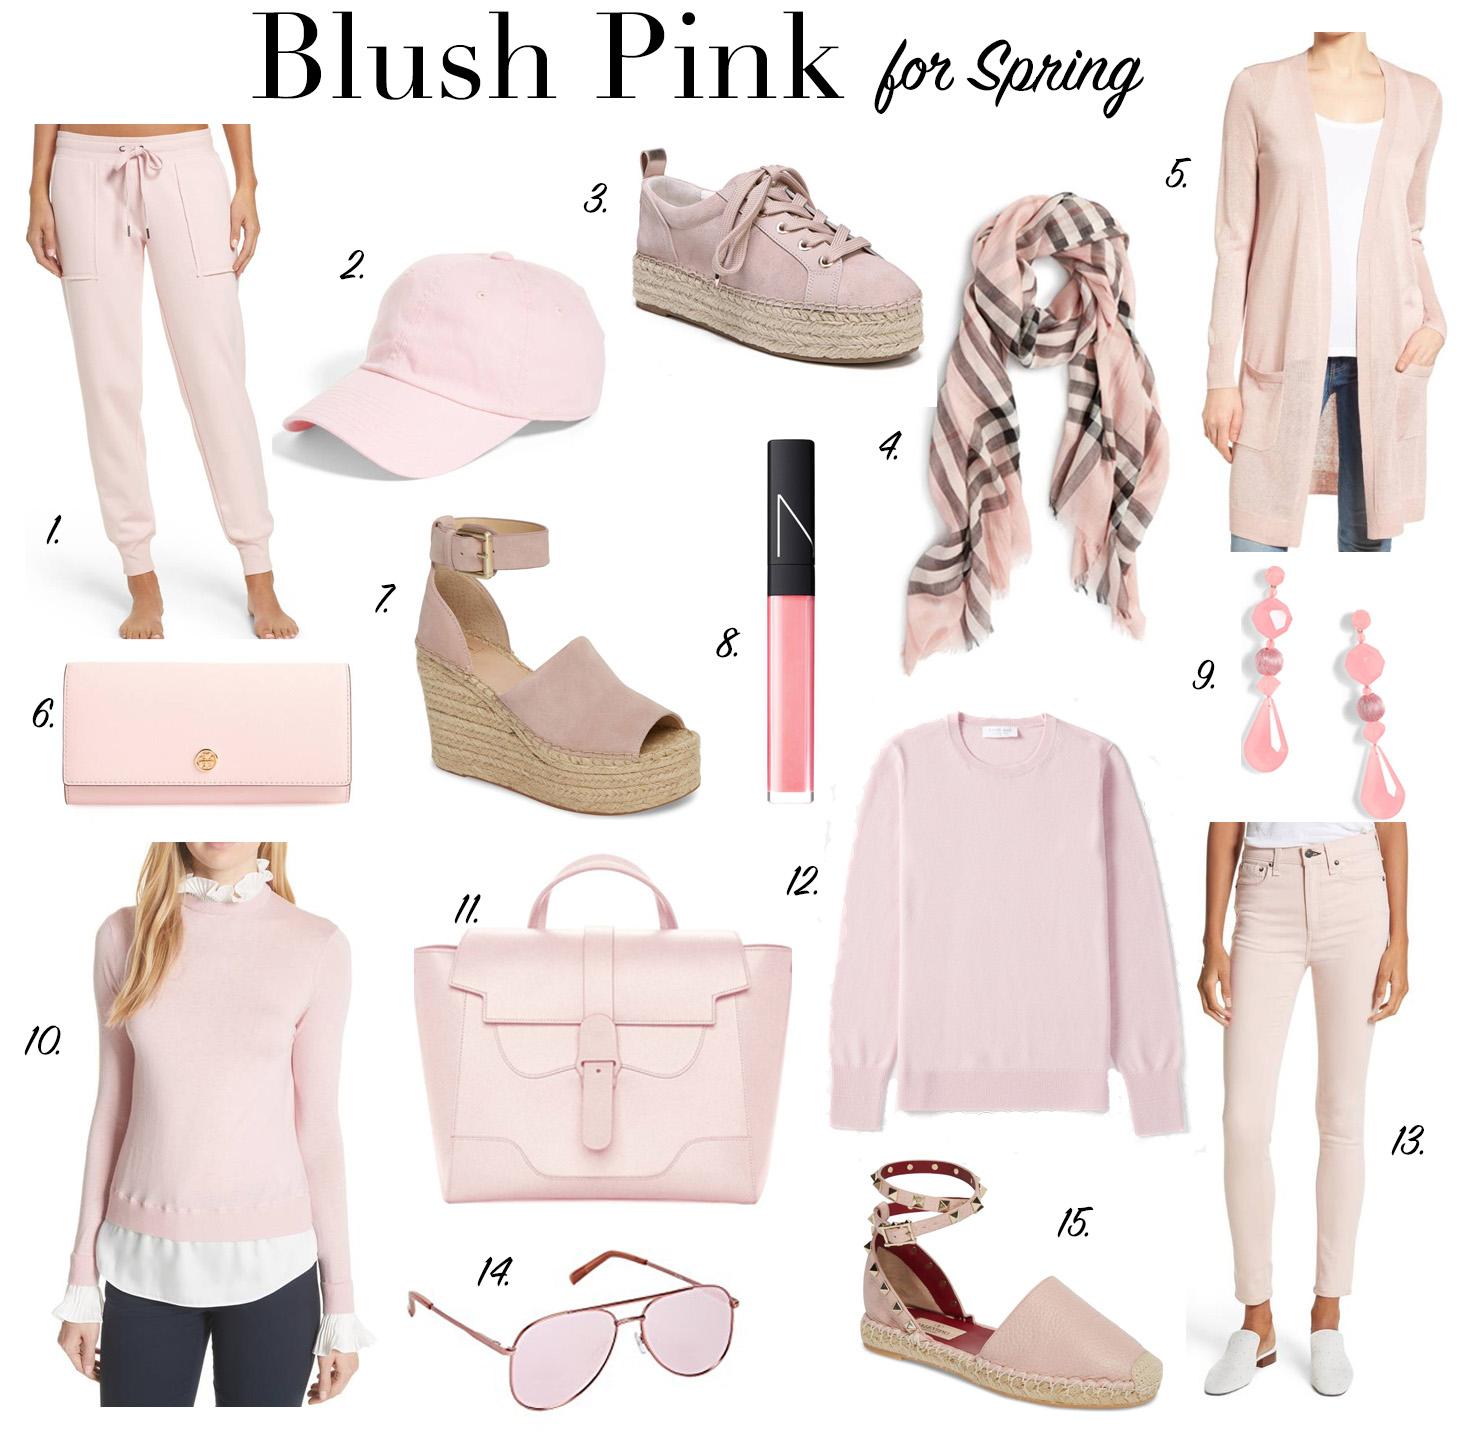 blush pink for spring